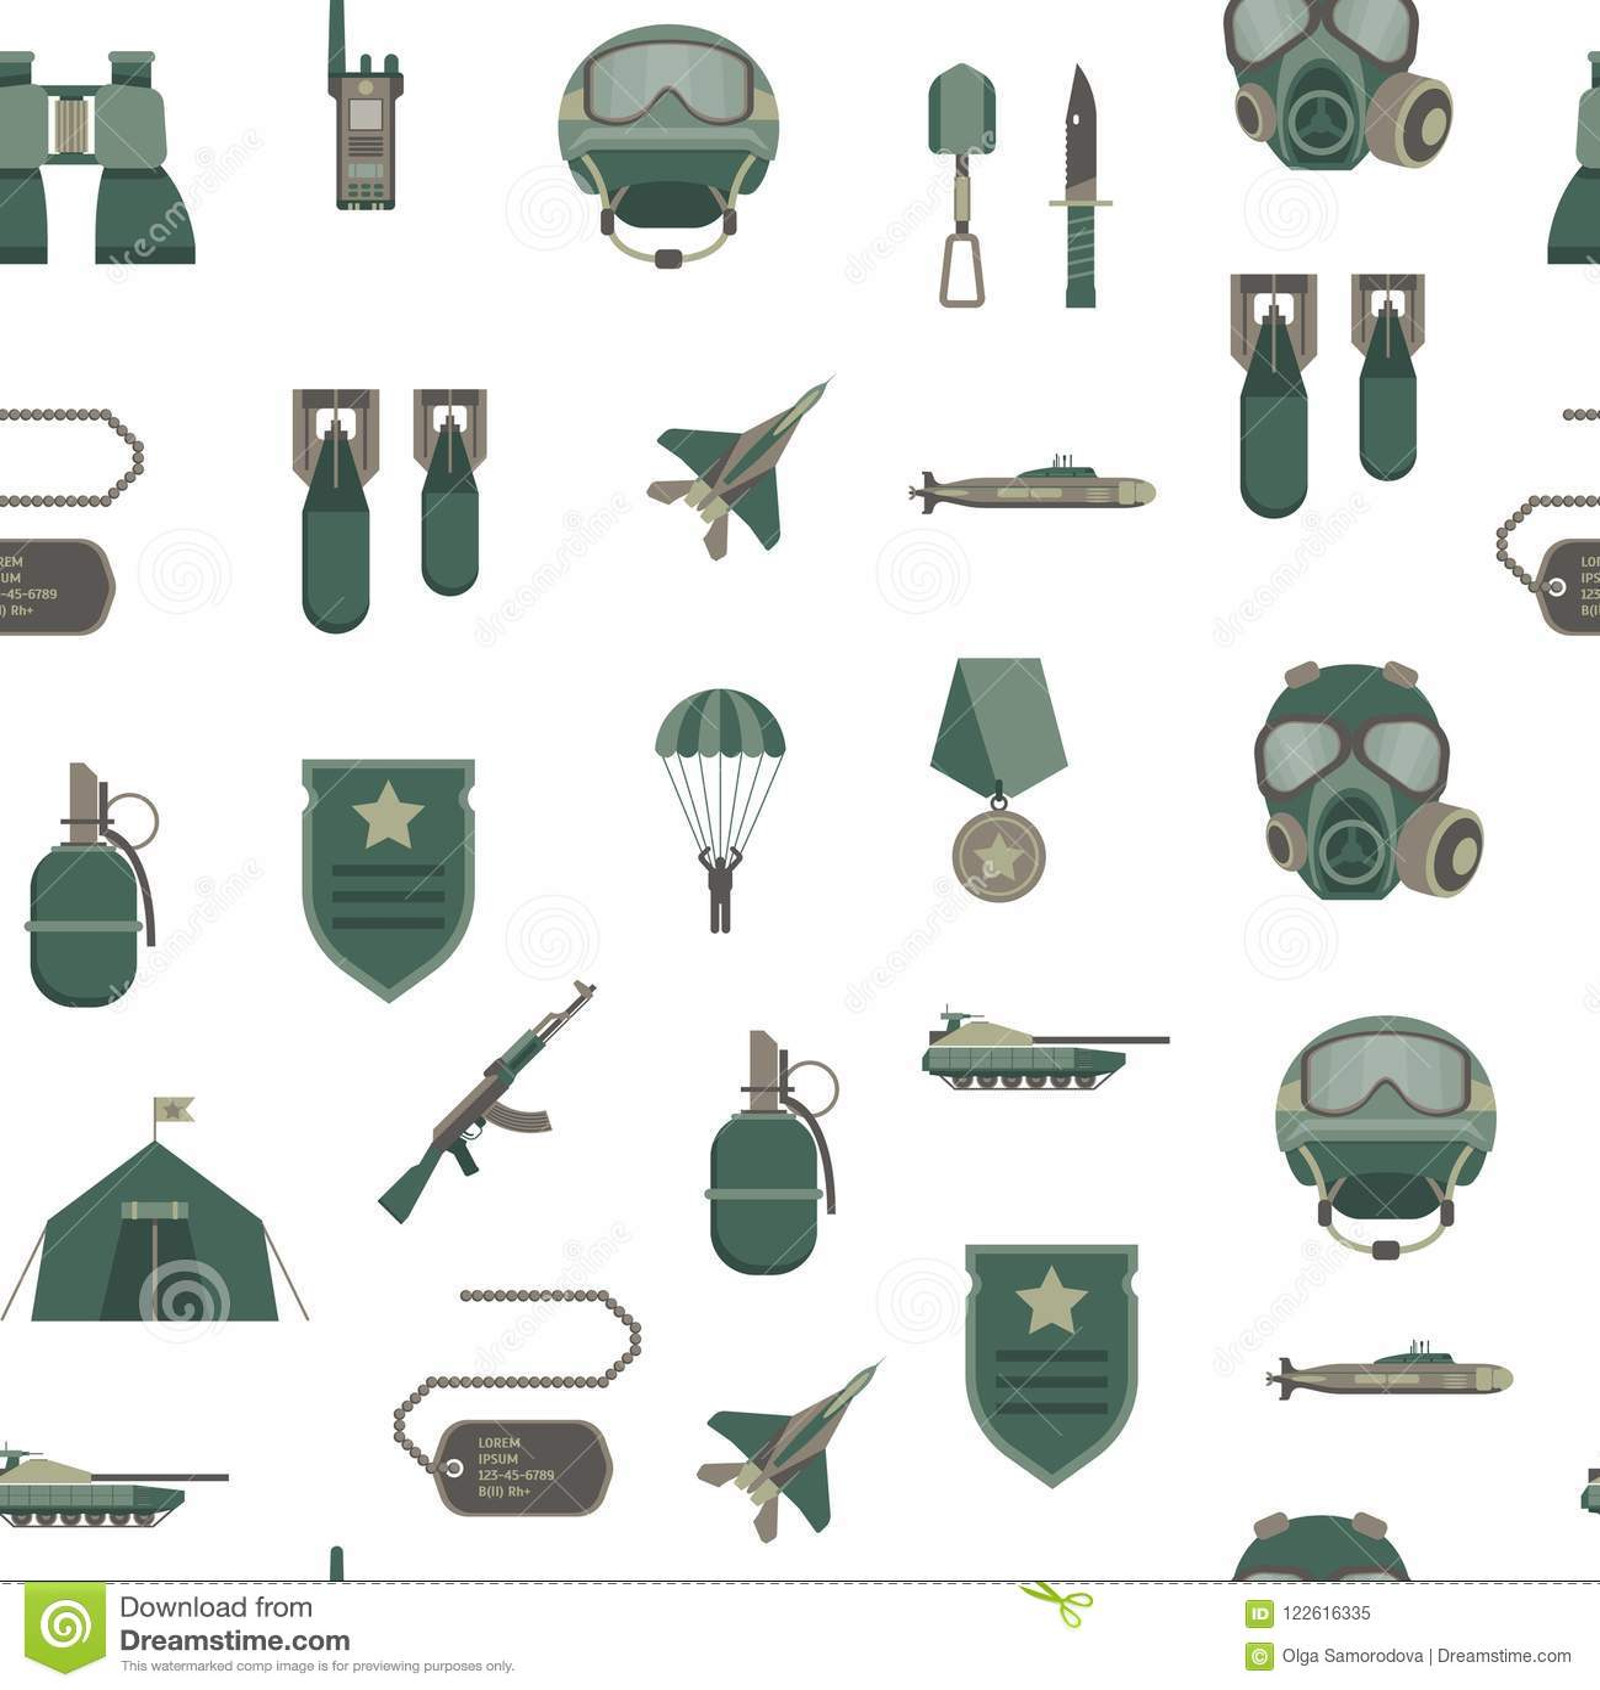 Karikatur-Farbarmee-Waffen-nahtloser Muster-Hintergrund Vektor